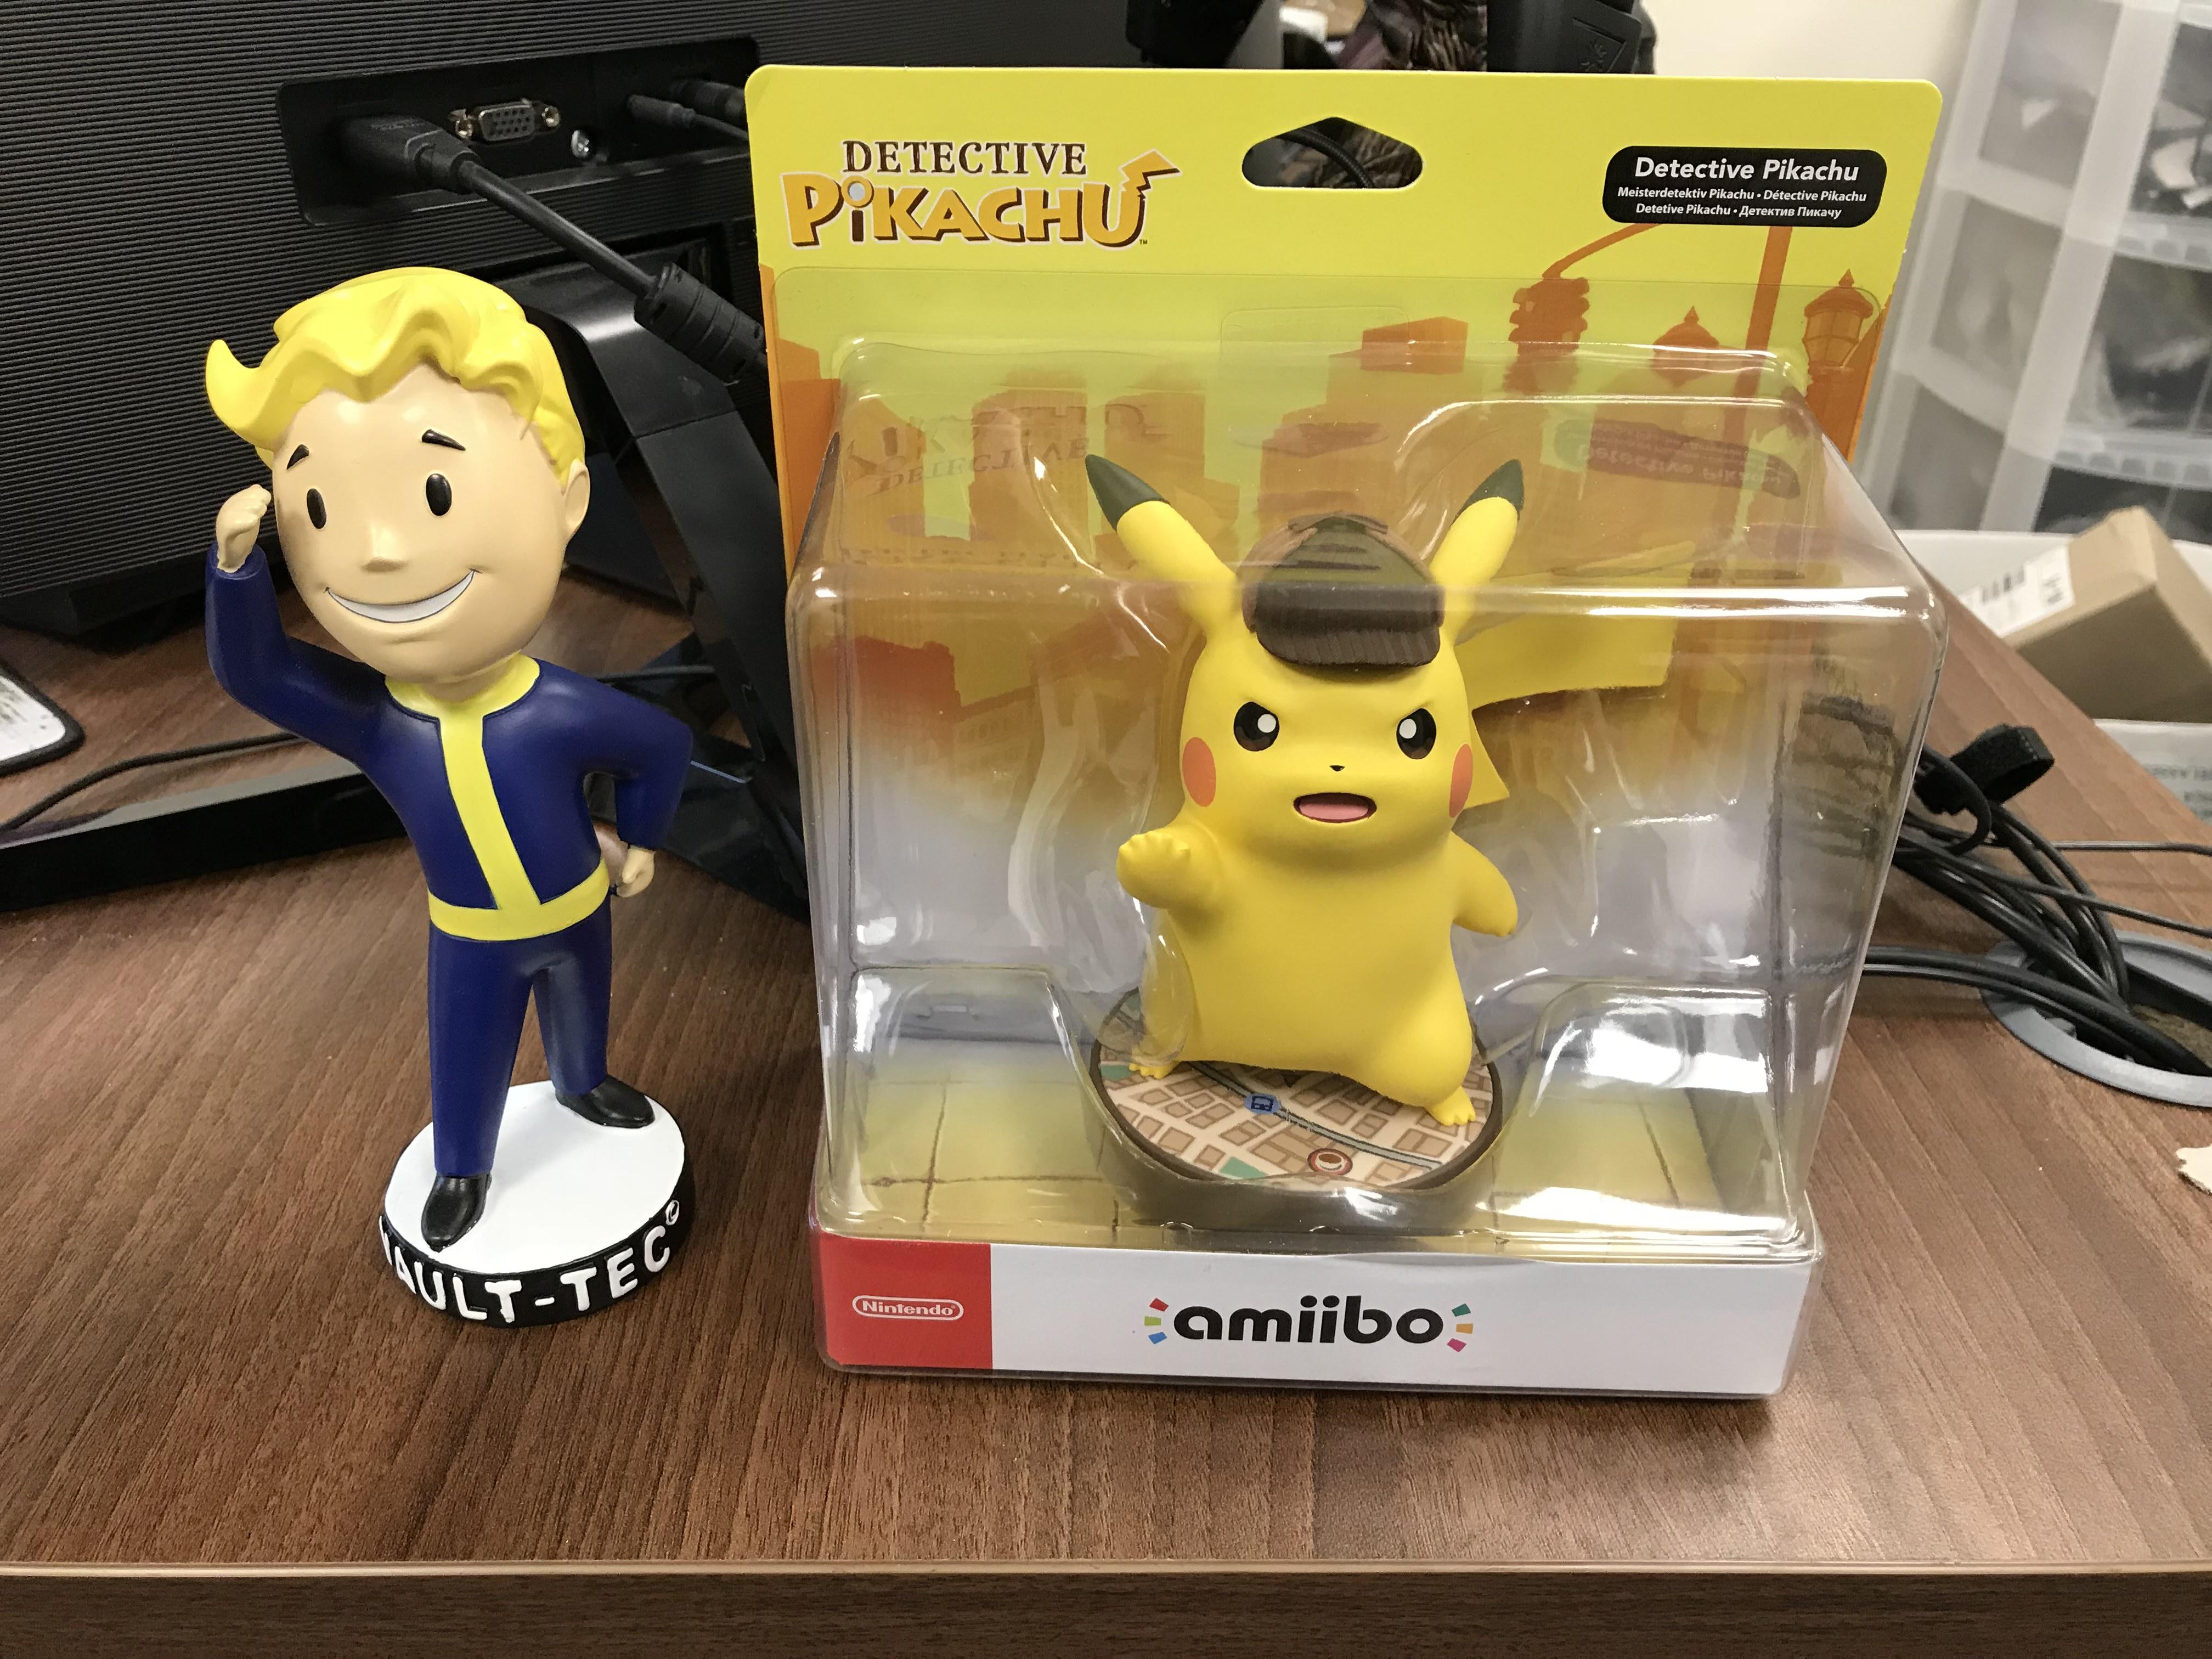 Detective pikachu amiibo 1499 argos hotukdeals 33498205 d9zceg fandeluxe Images